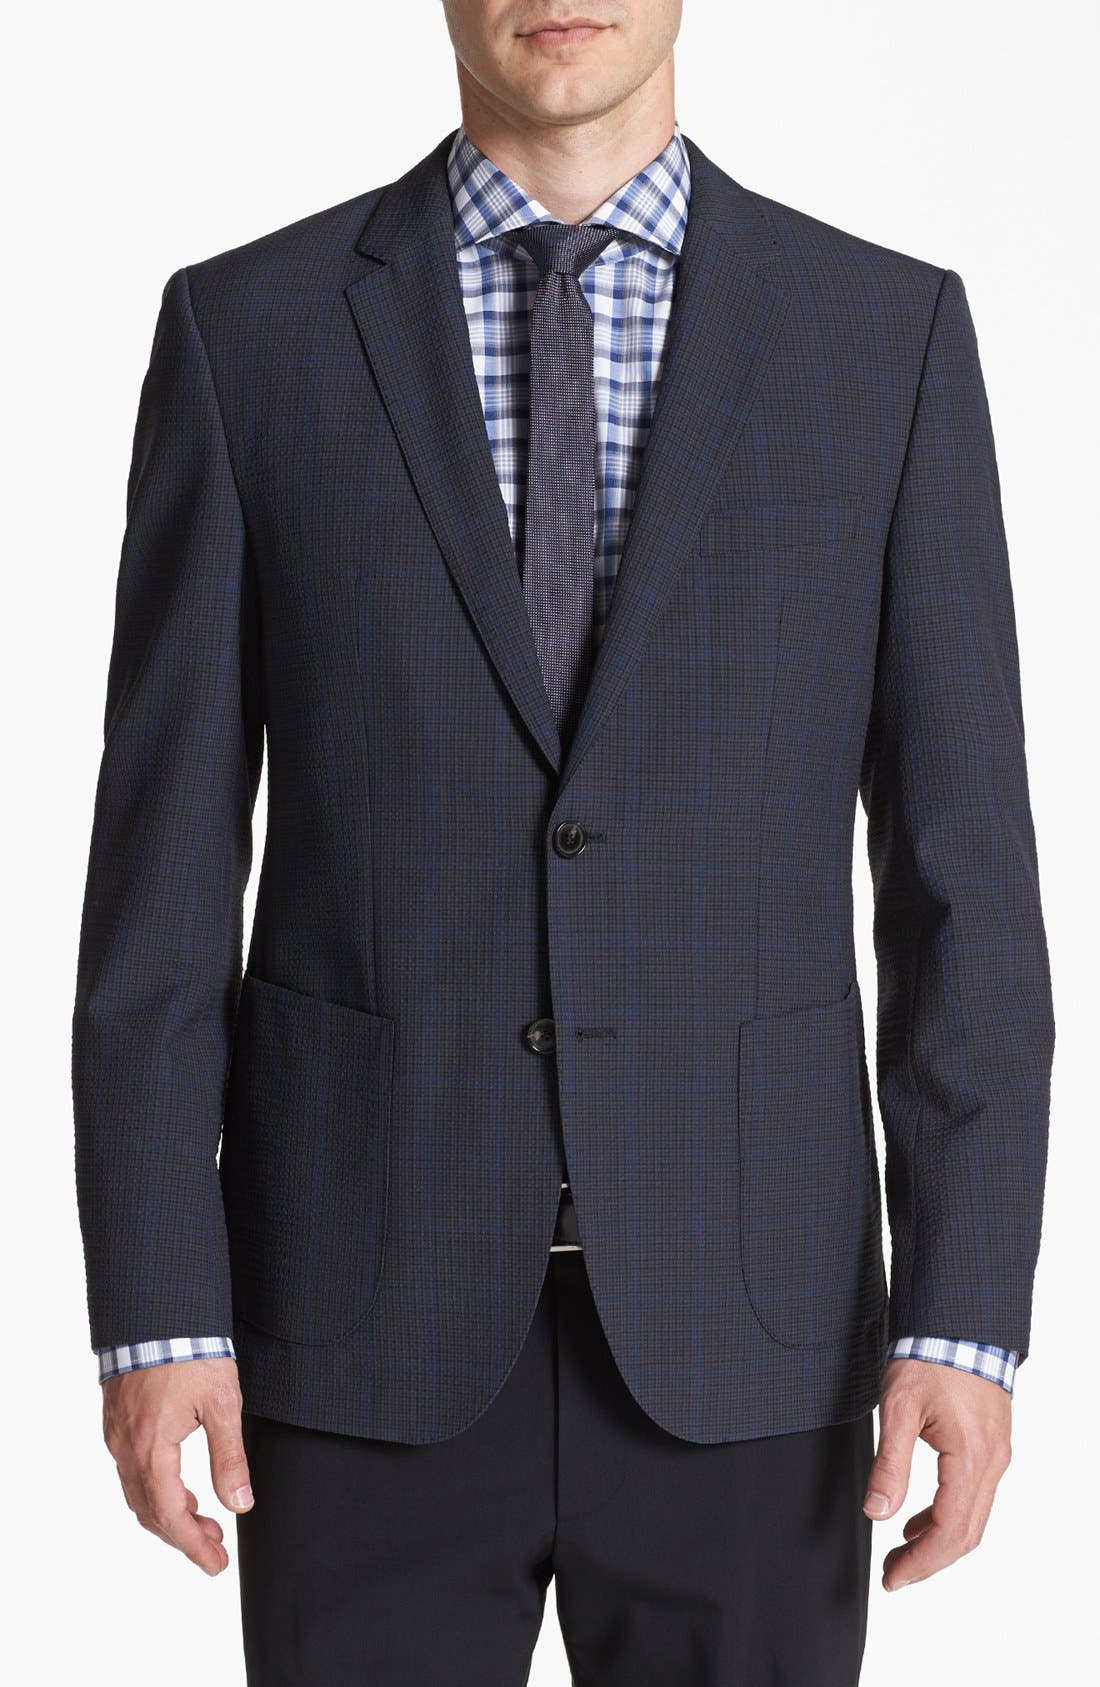 Main Image - BOSS HUGO BOSS 'Jesse' Trim Fit Plaid Sportcoat